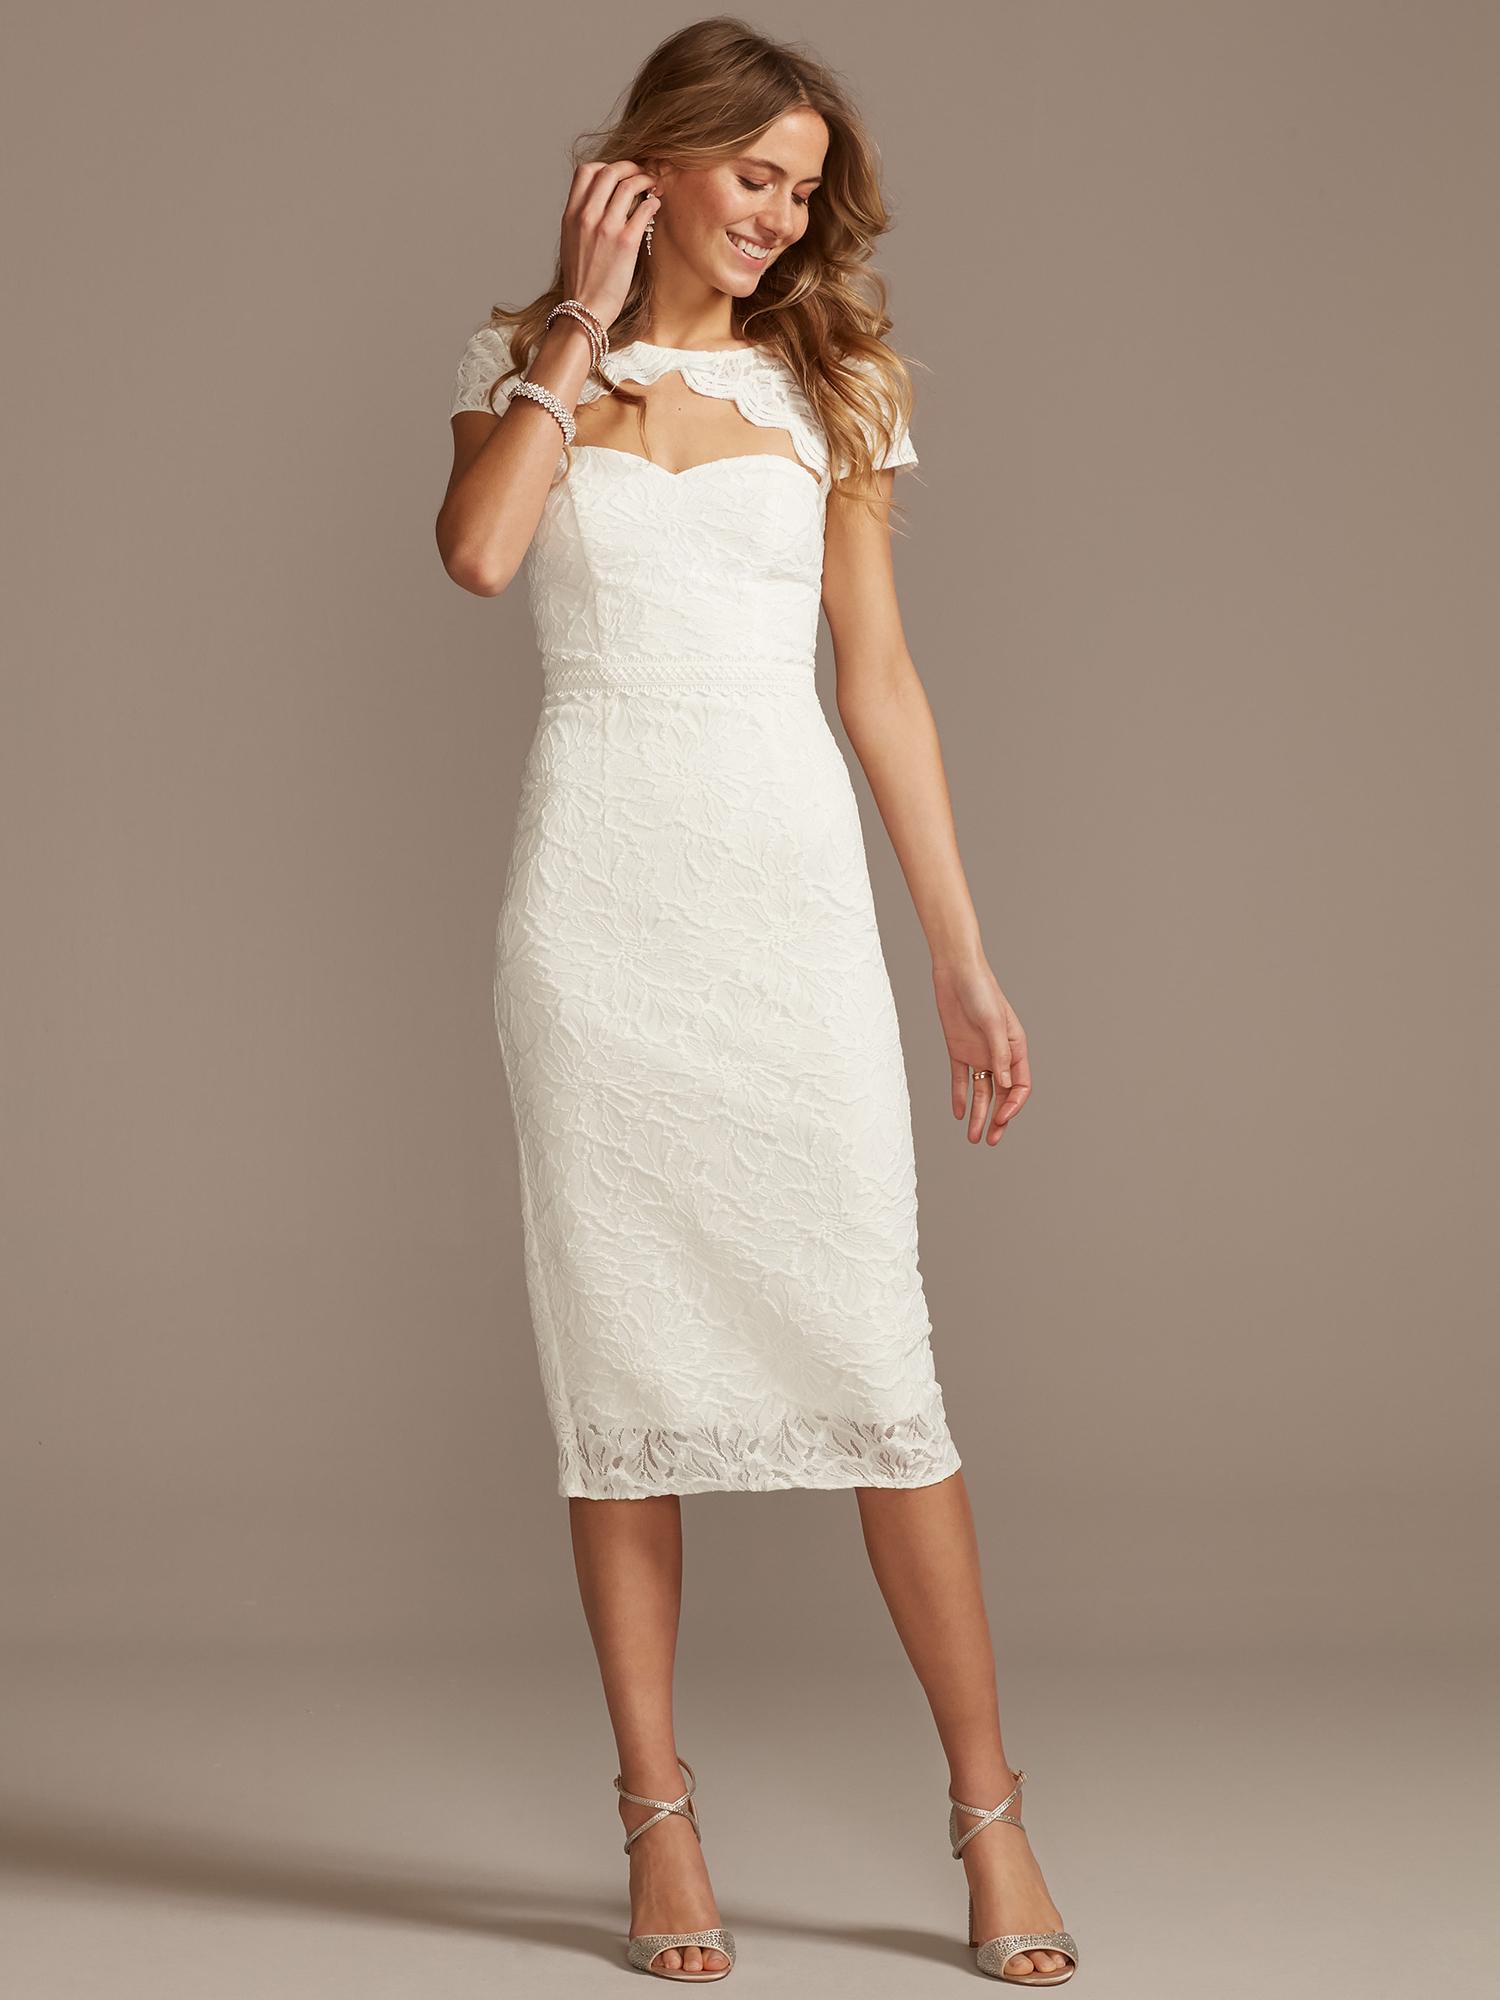 davids bridal front key-hole short sleeve knee-length wedding dress spring 2021